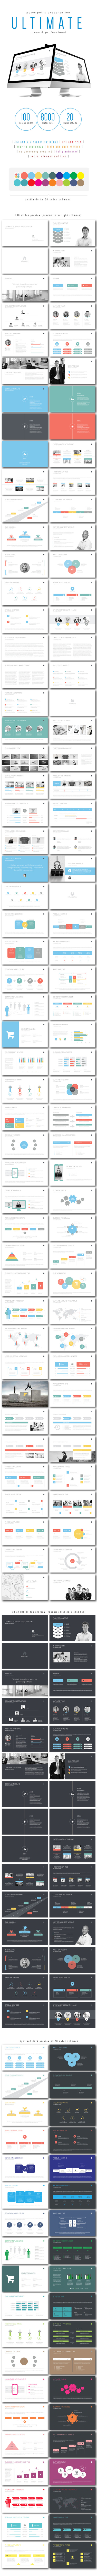 Multipurpose PowerPoint Presentation (Vol. 08) - Powerpoint Templates Presentation Templates